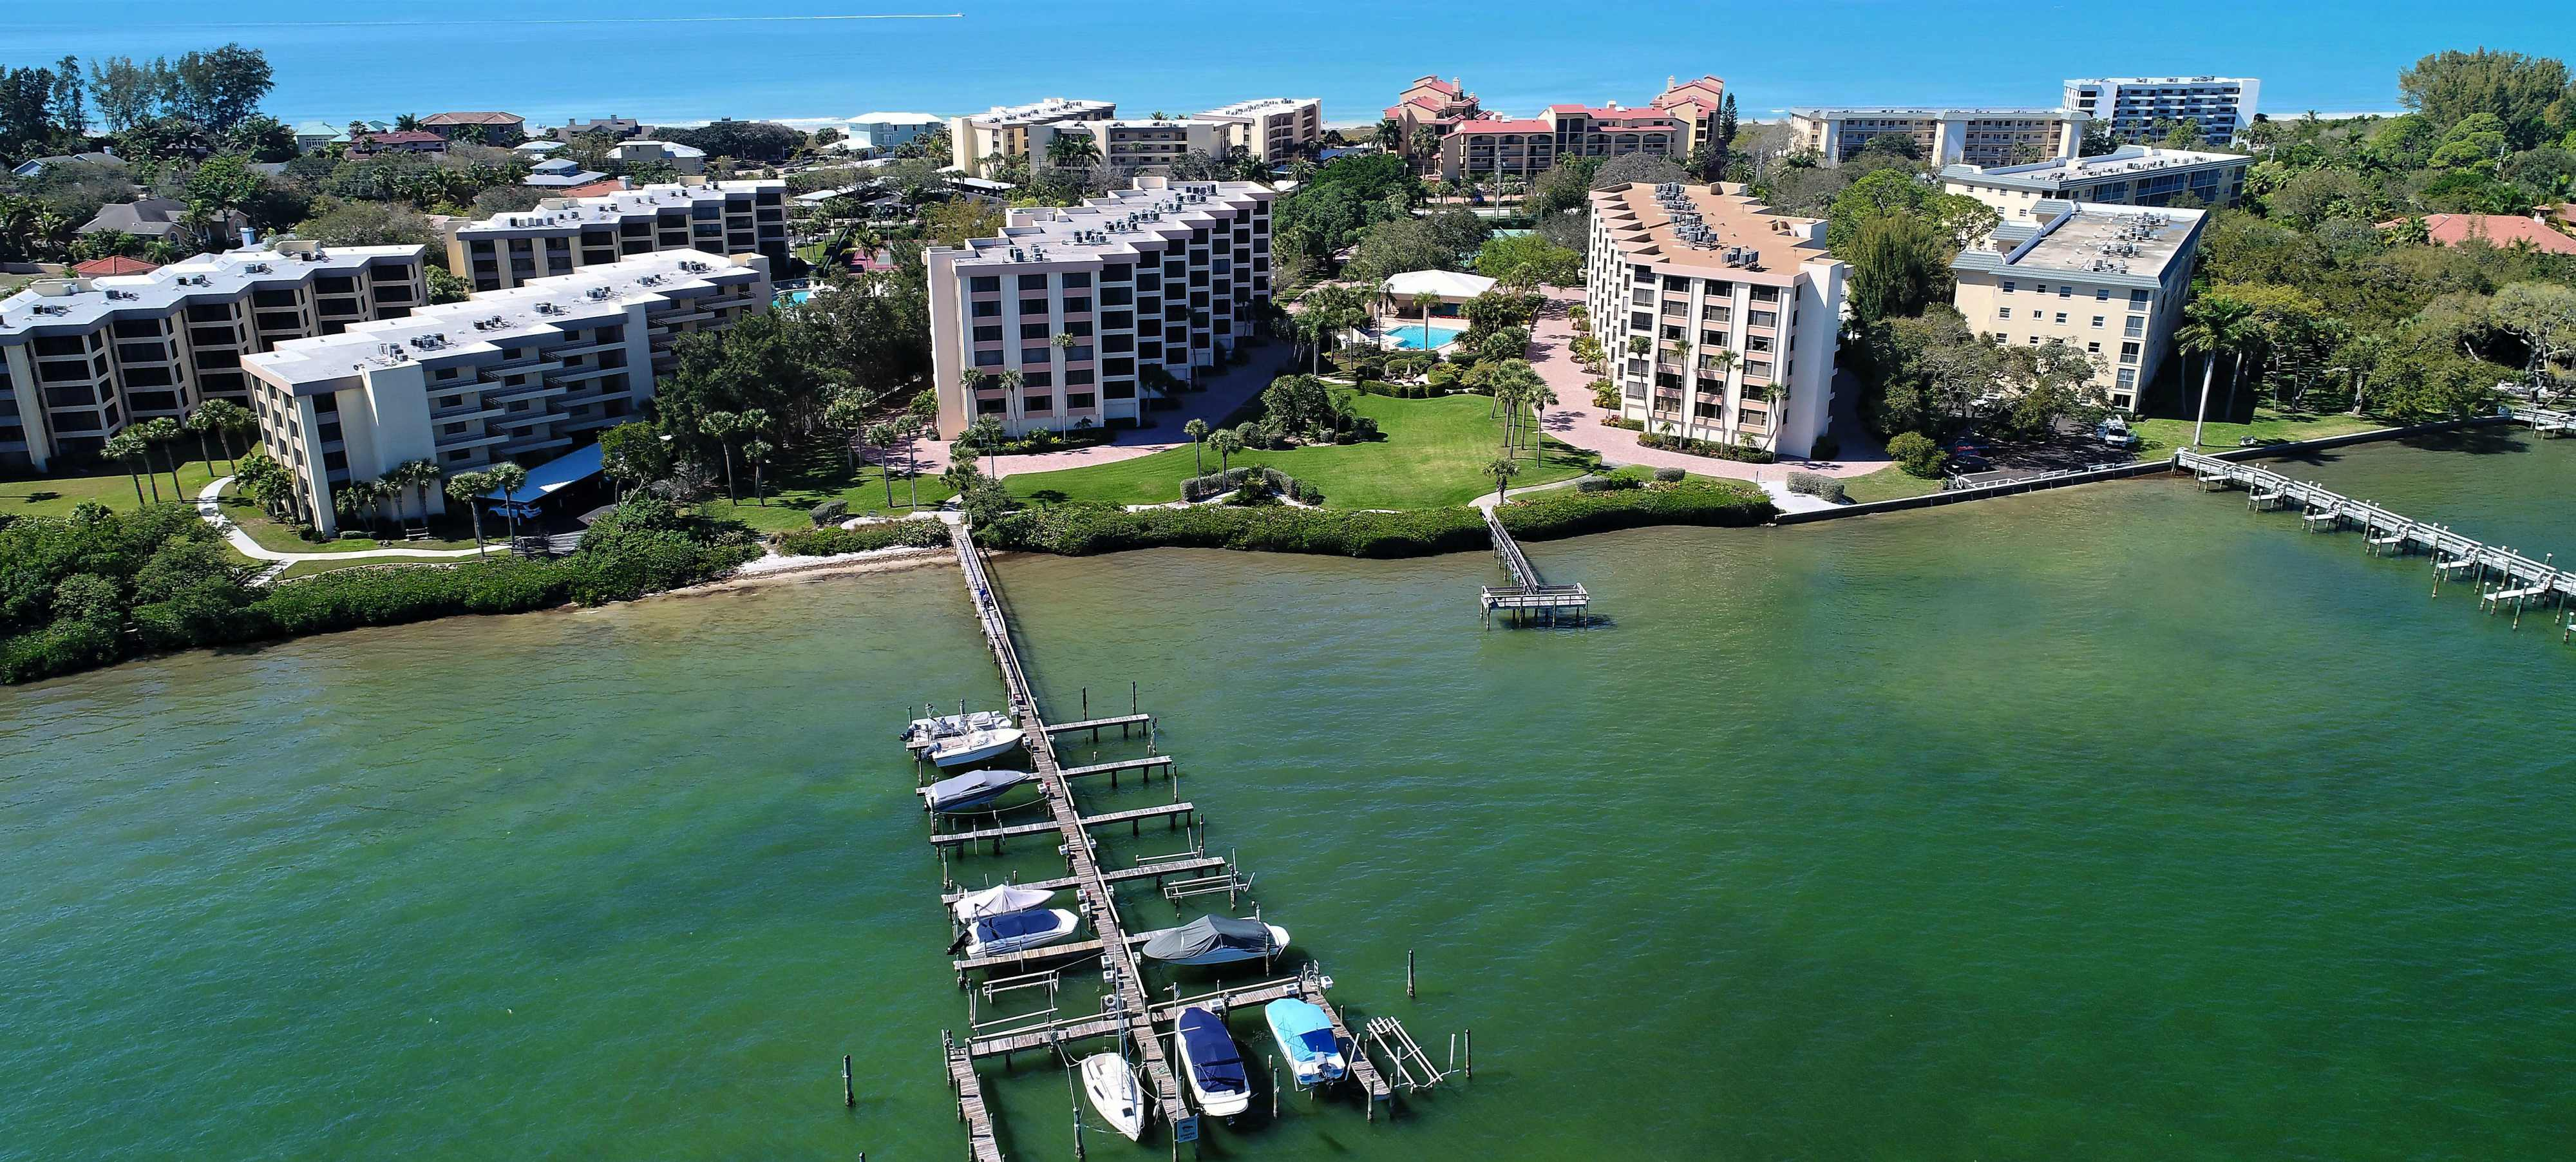 Turtle Bay in Siesta Key : Bay Side Condos for Sale